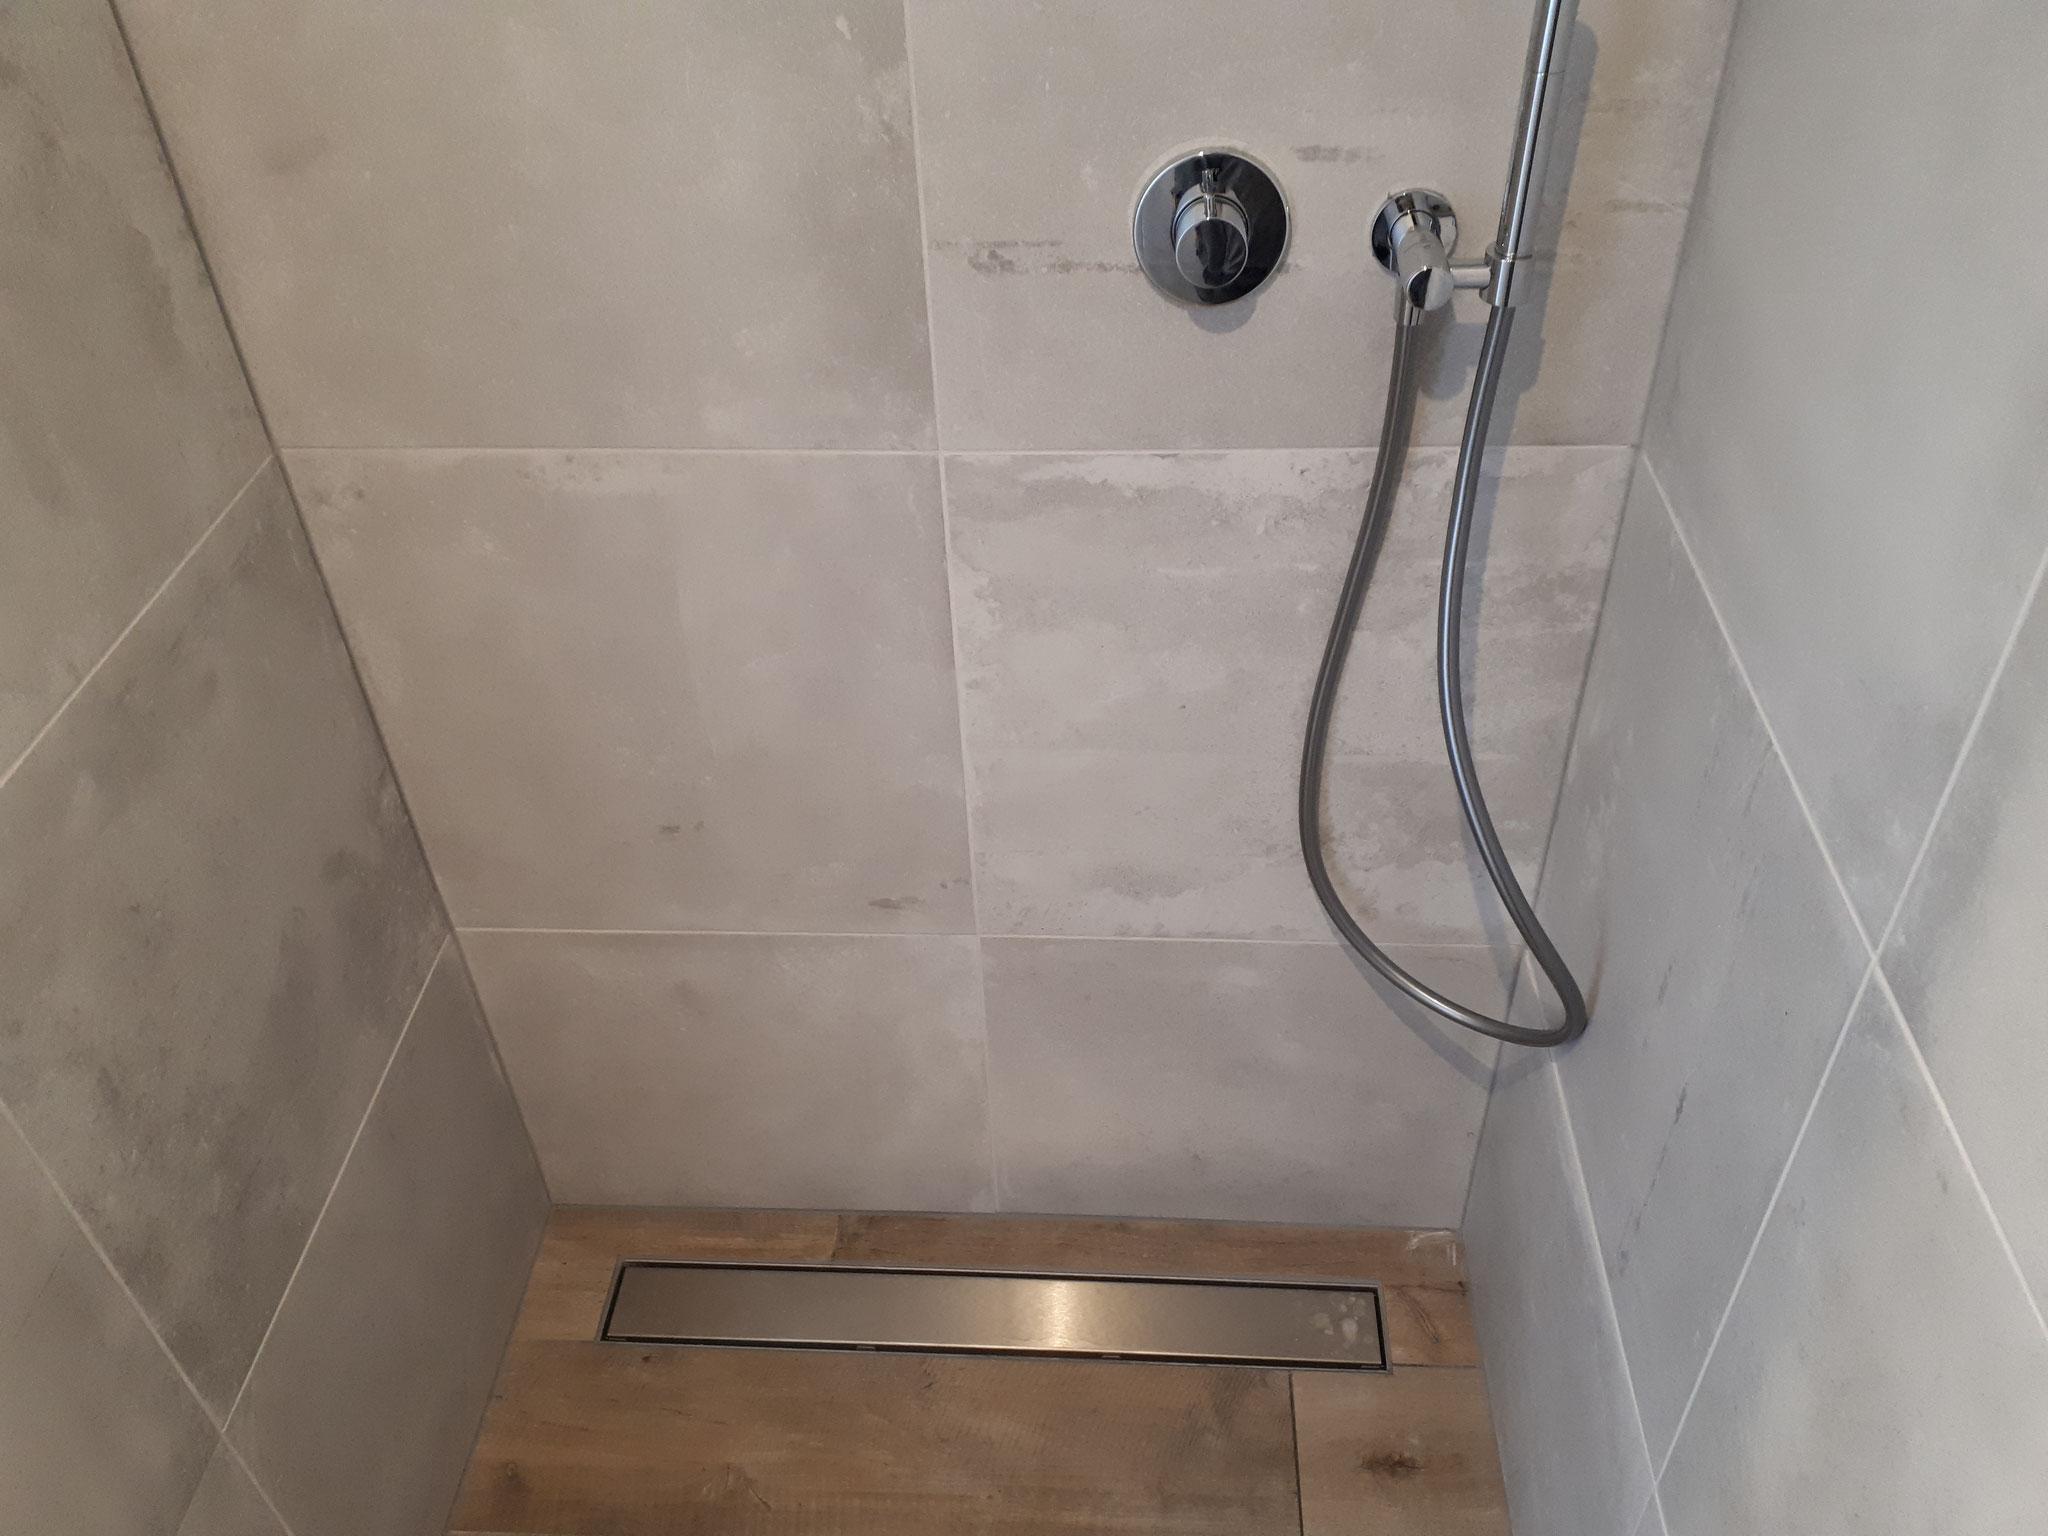 Afzuiging Badkamer Nodig : Elektrische afzuiging badkamer waterkering dorpel